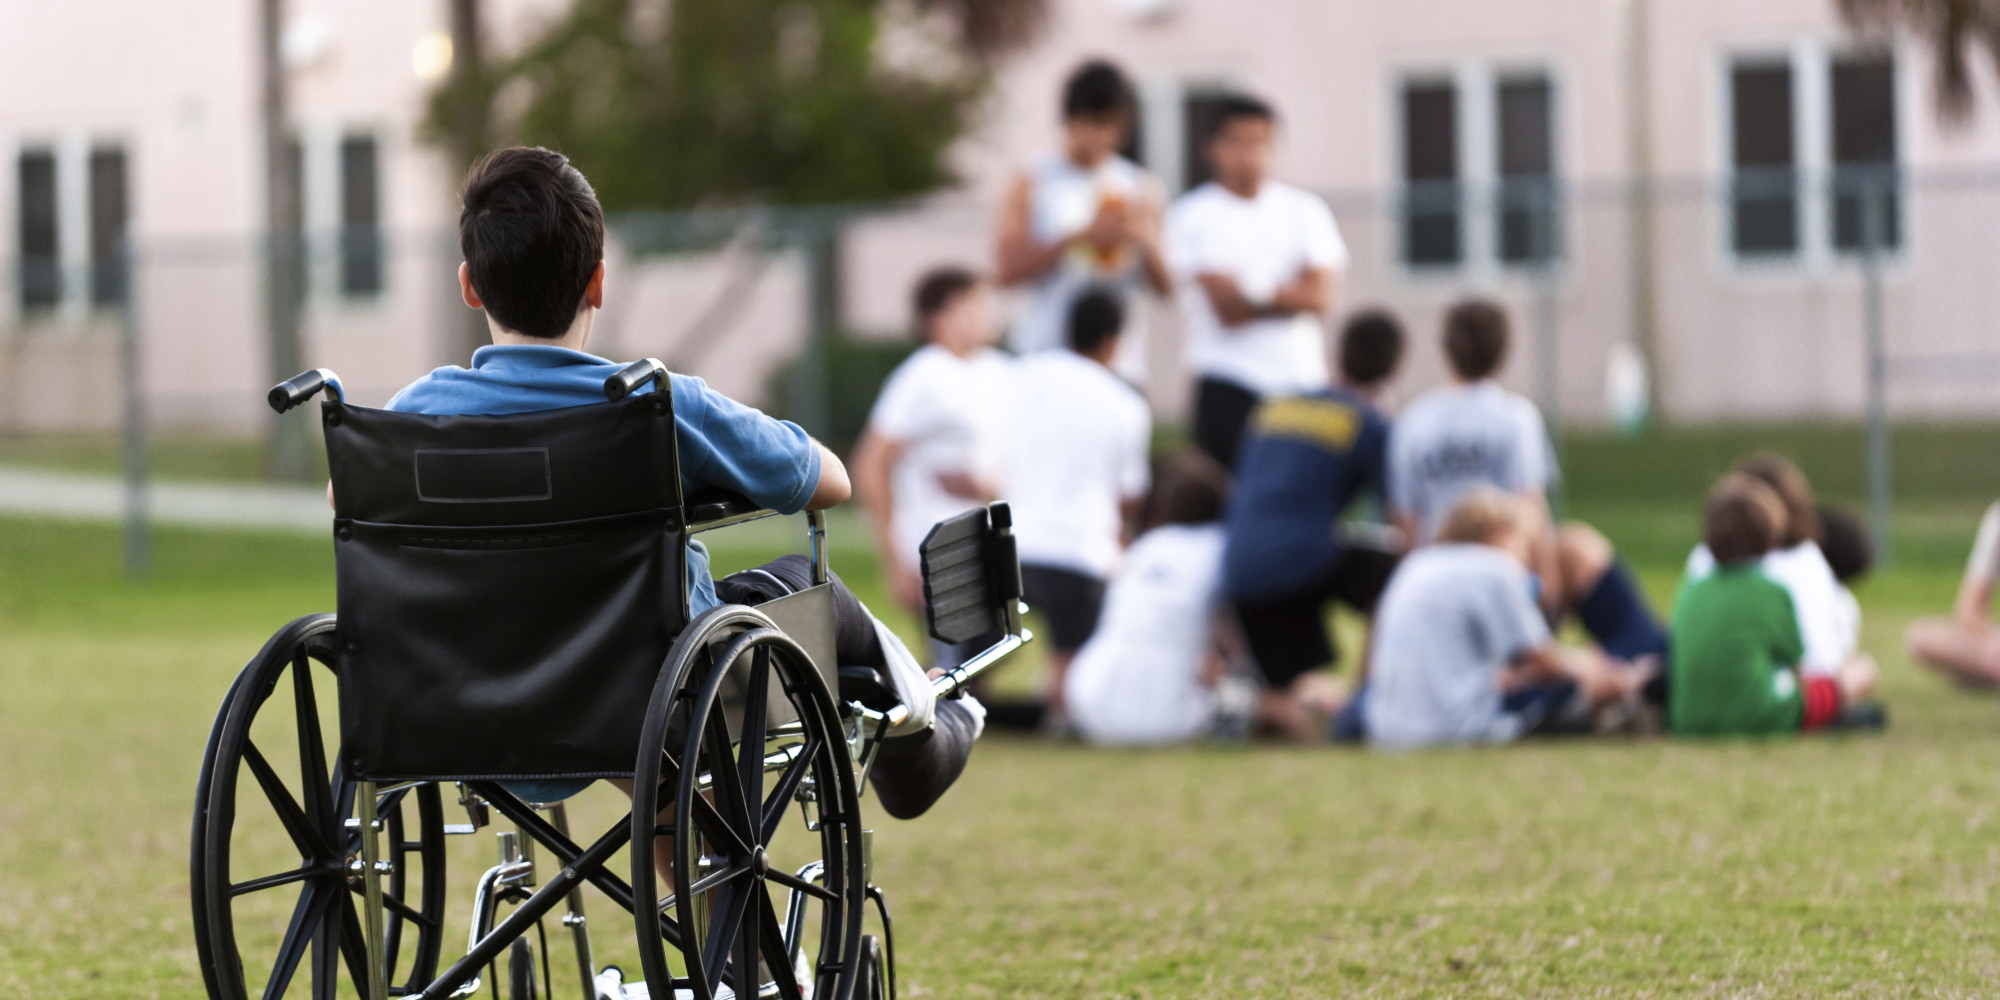 o-disability-discrimination-facebook.jpg